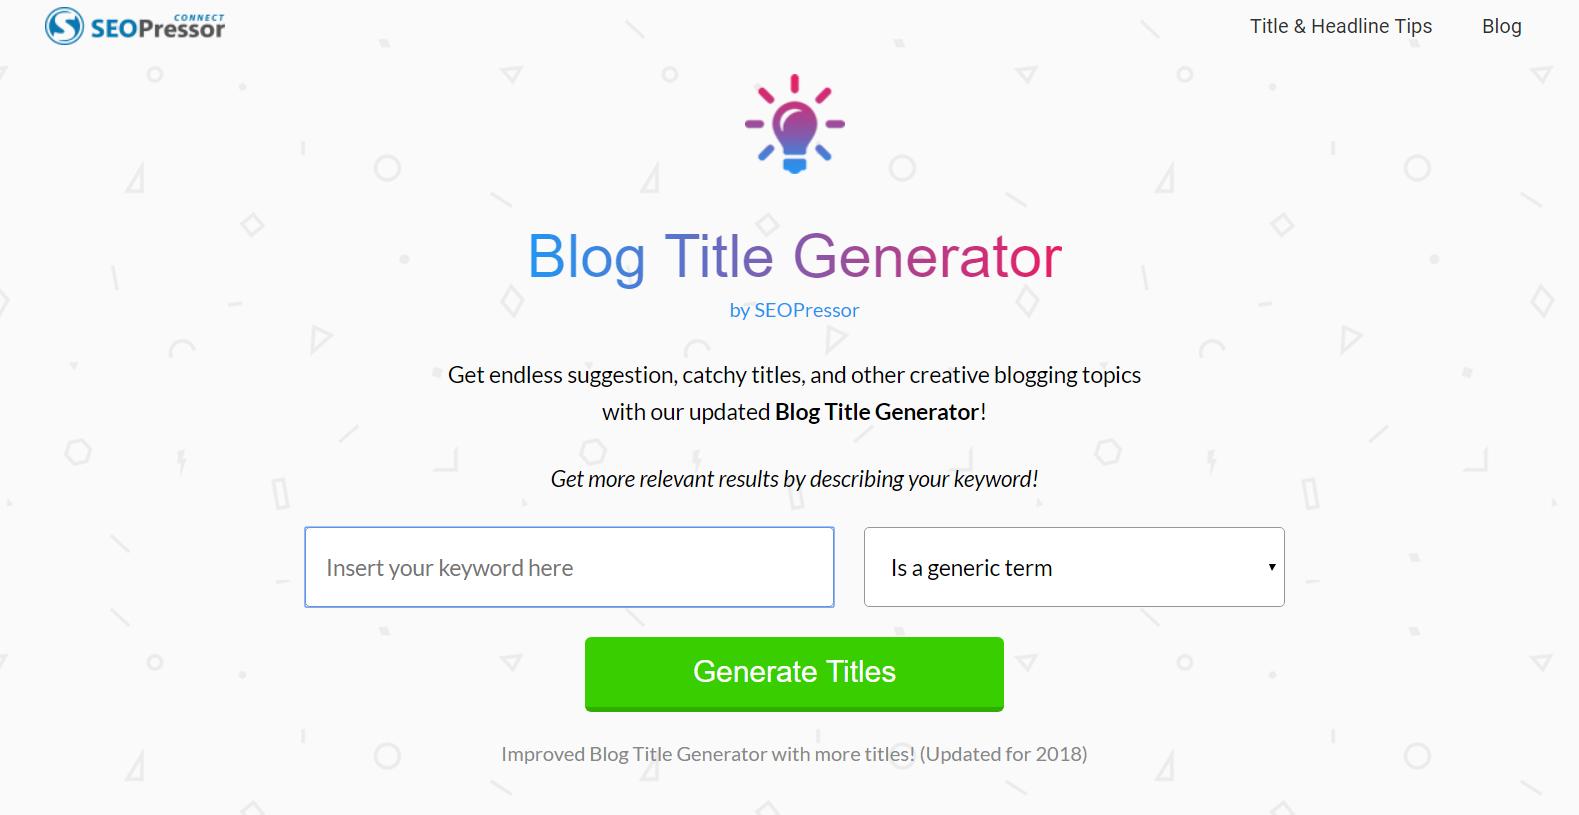 2018 Blog Title Generator SEOPressor